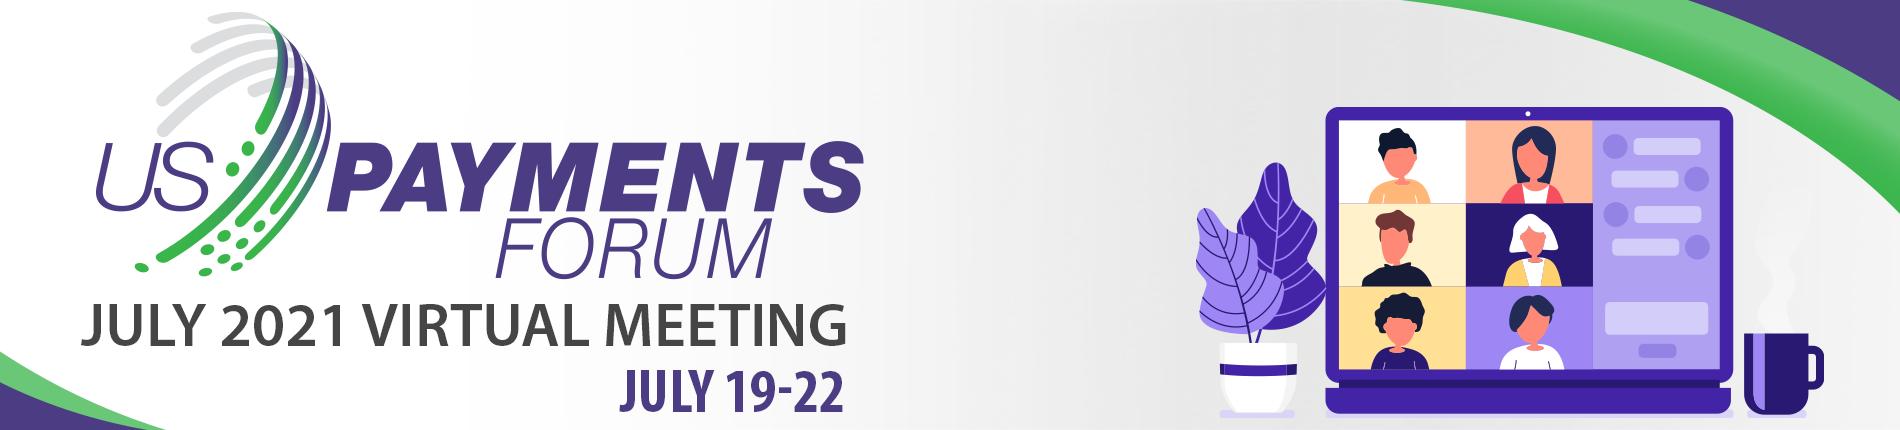 July 2021 U.S. Payments Forum Virtual Meeting